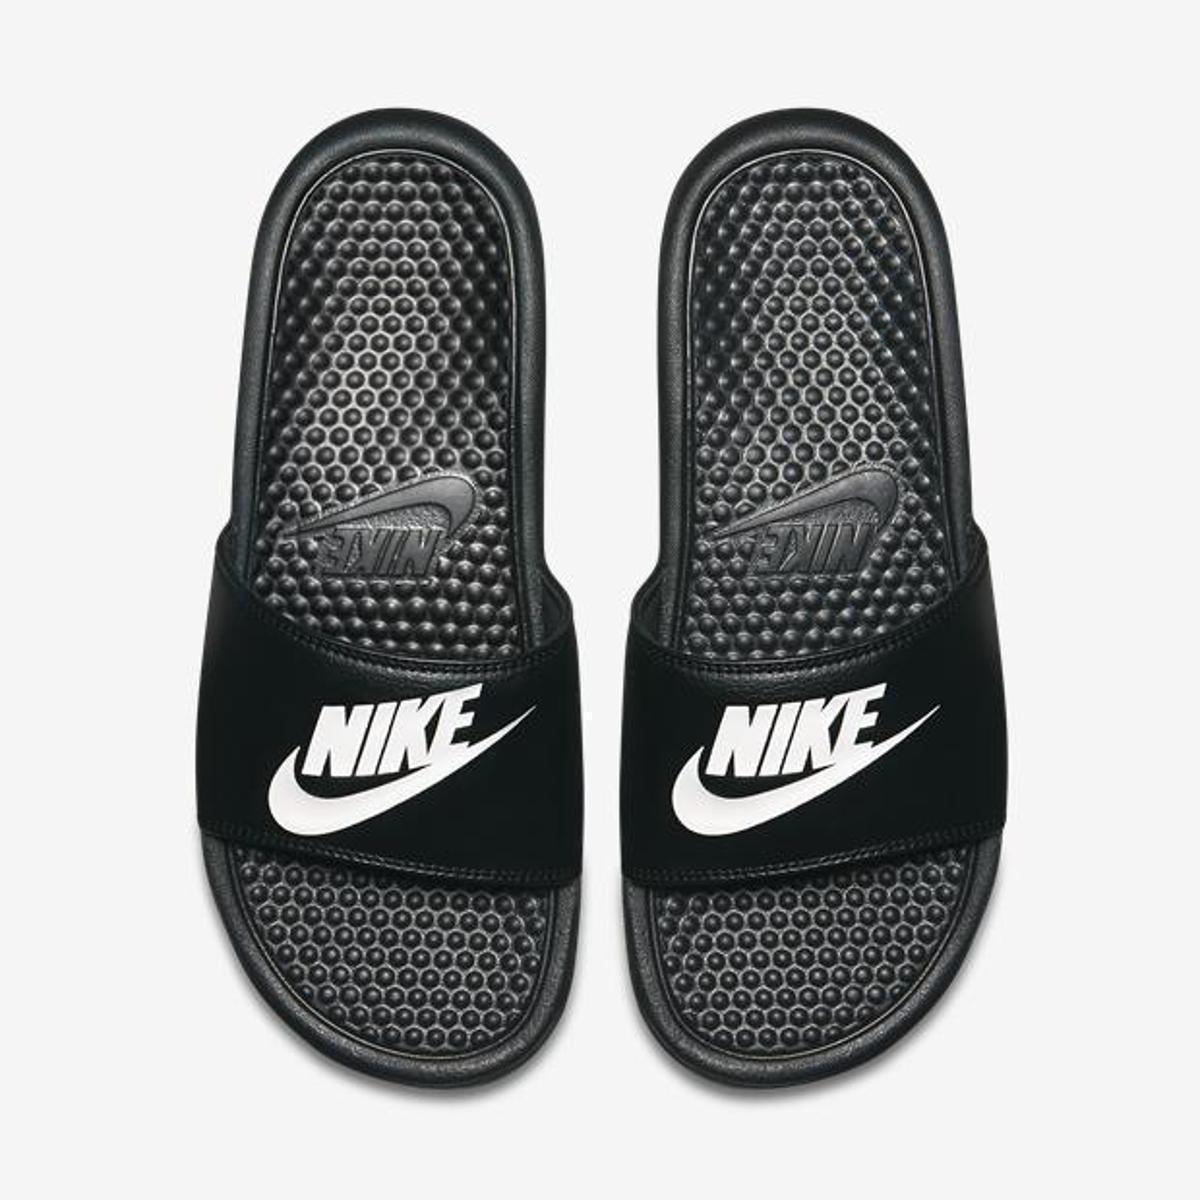 7baaa7ef684 Sandália Nike Benassi JDI Masculina - Preto e Branco - Compre Agora ...